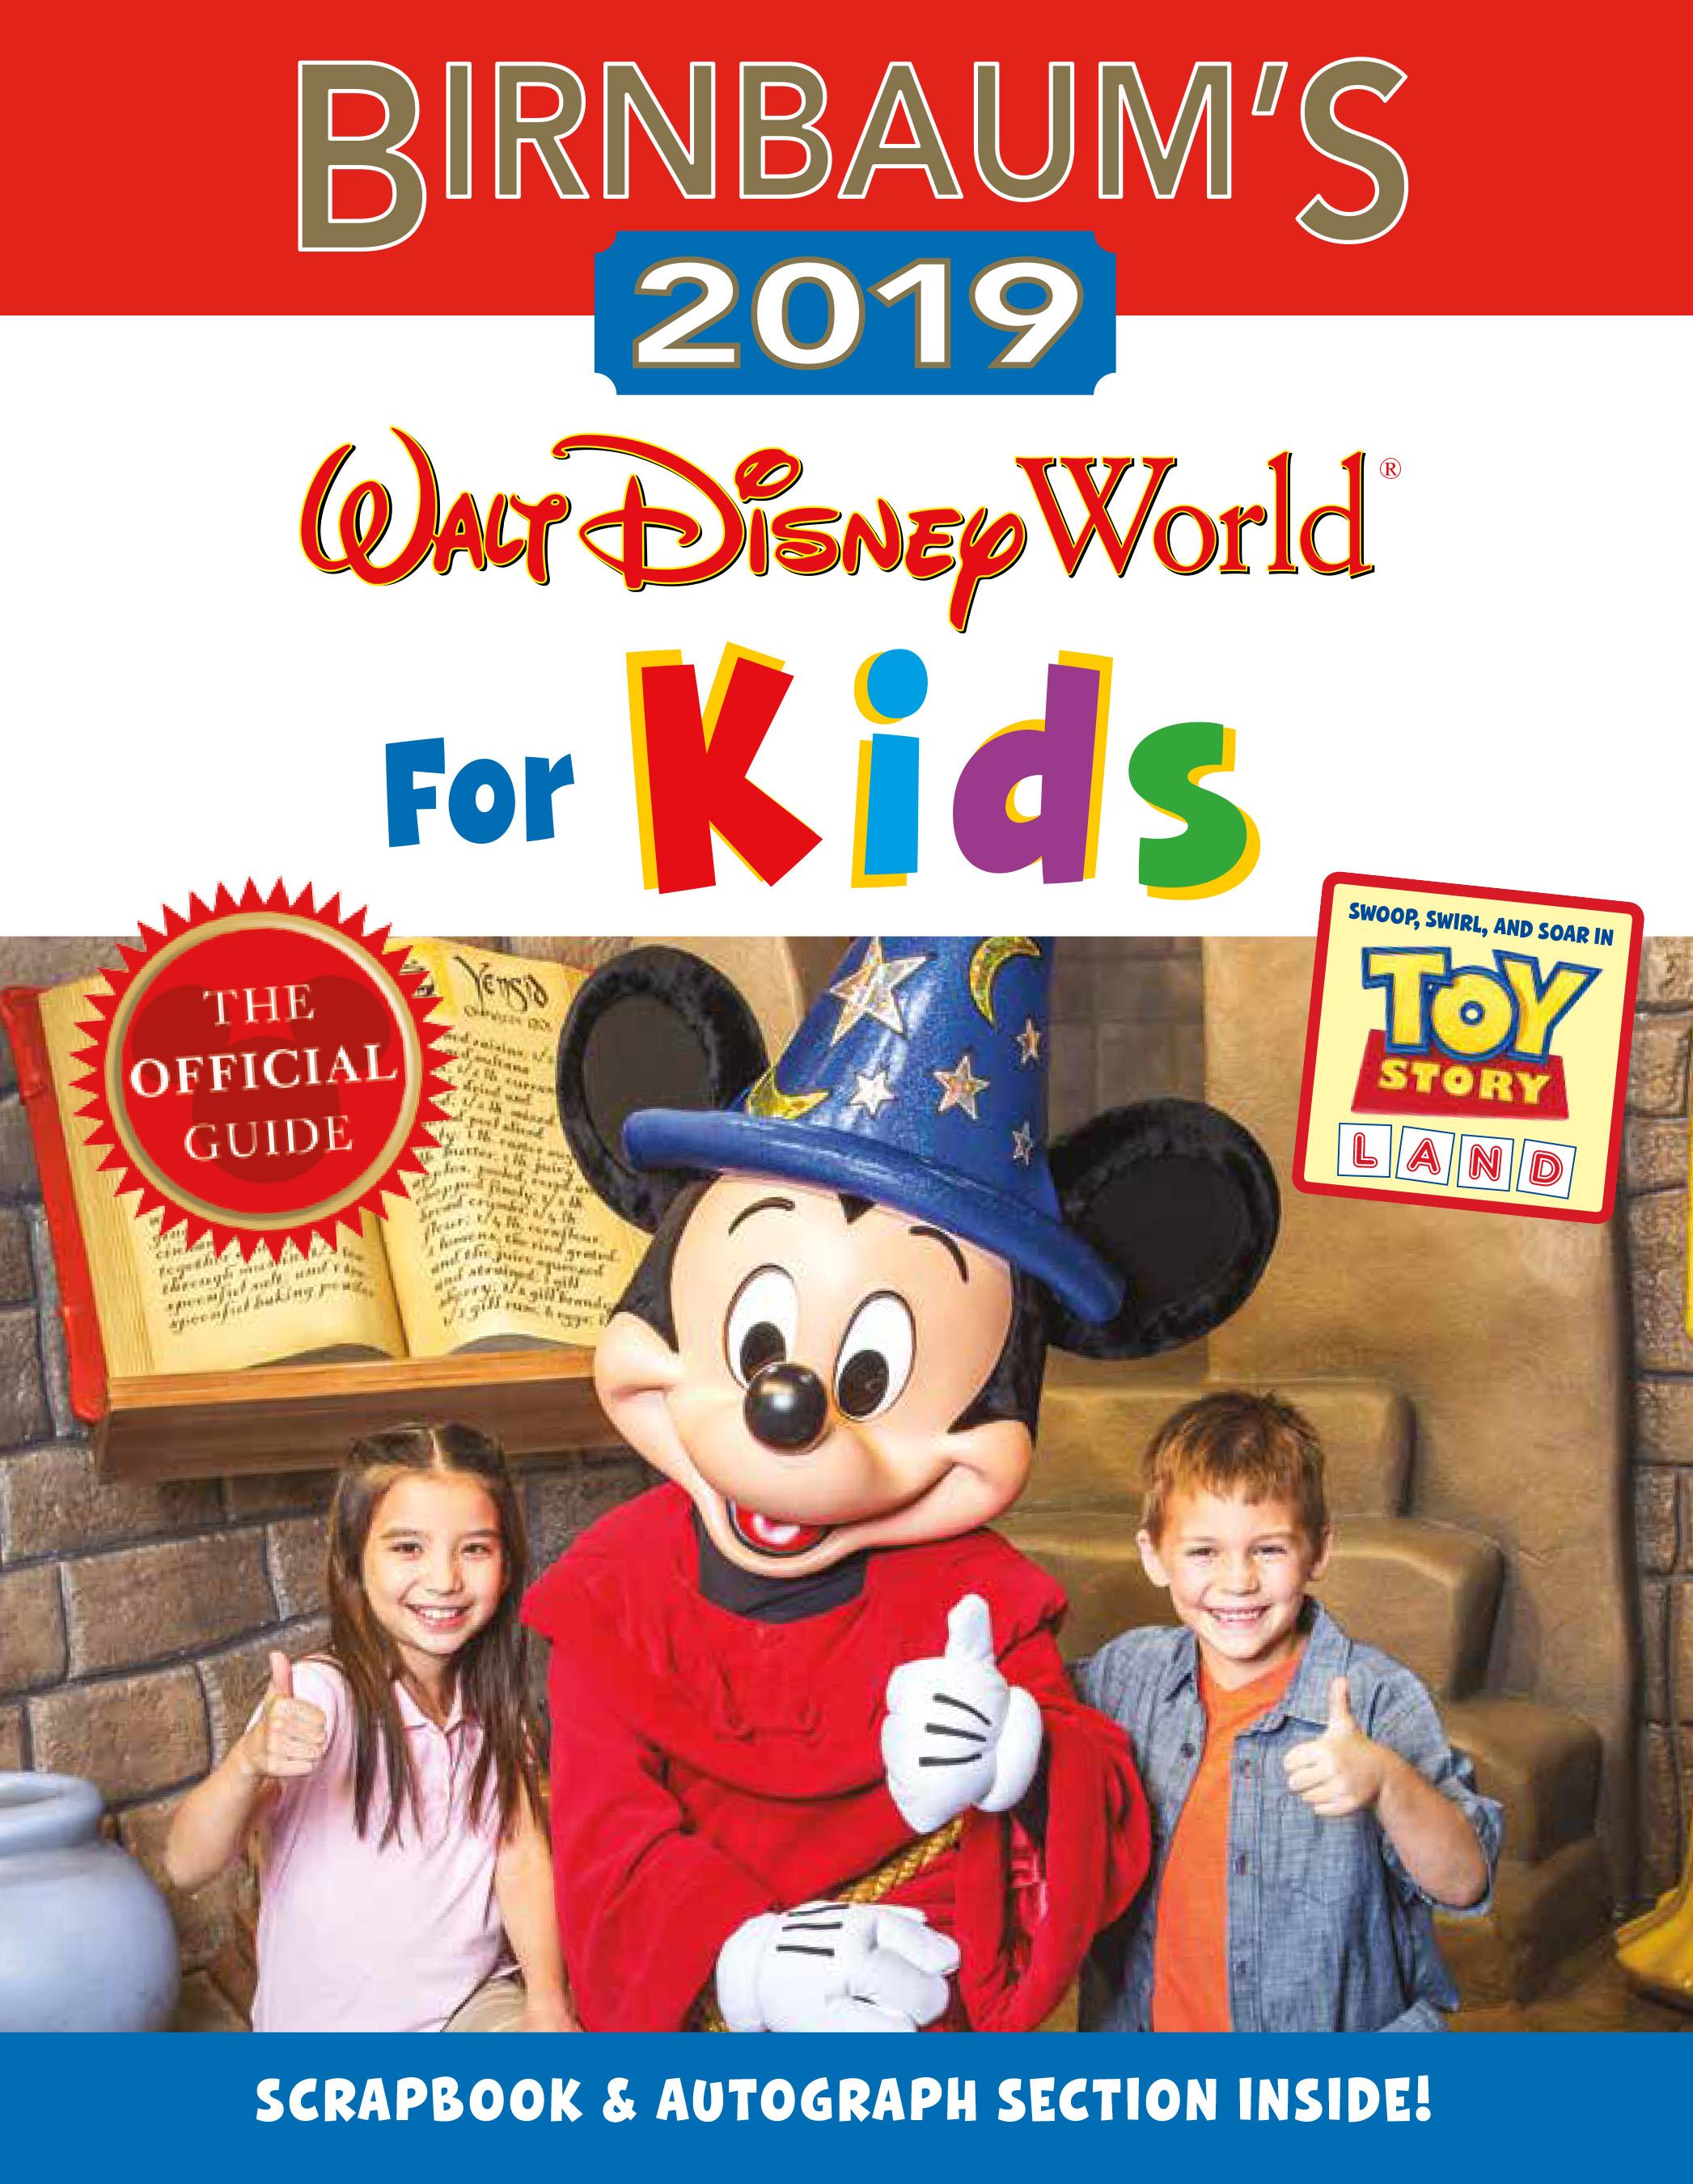 Birnbaum disney 2019 coupons